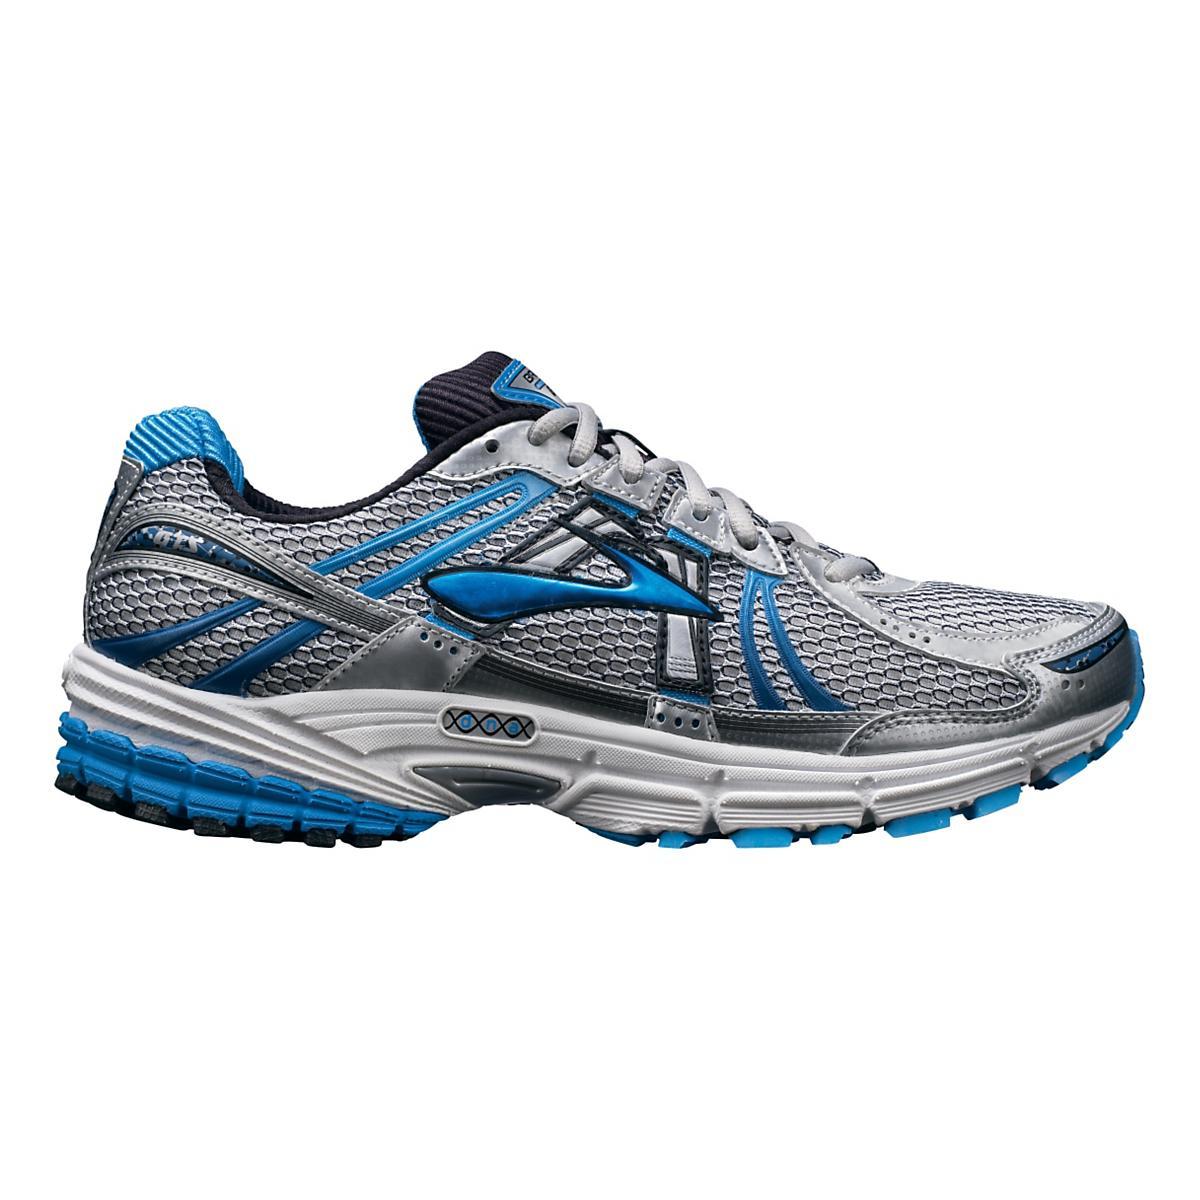 819f541c069b4 Mens Brooks Adrenaline GTS 12 Running Shoe at Road Runner Sports